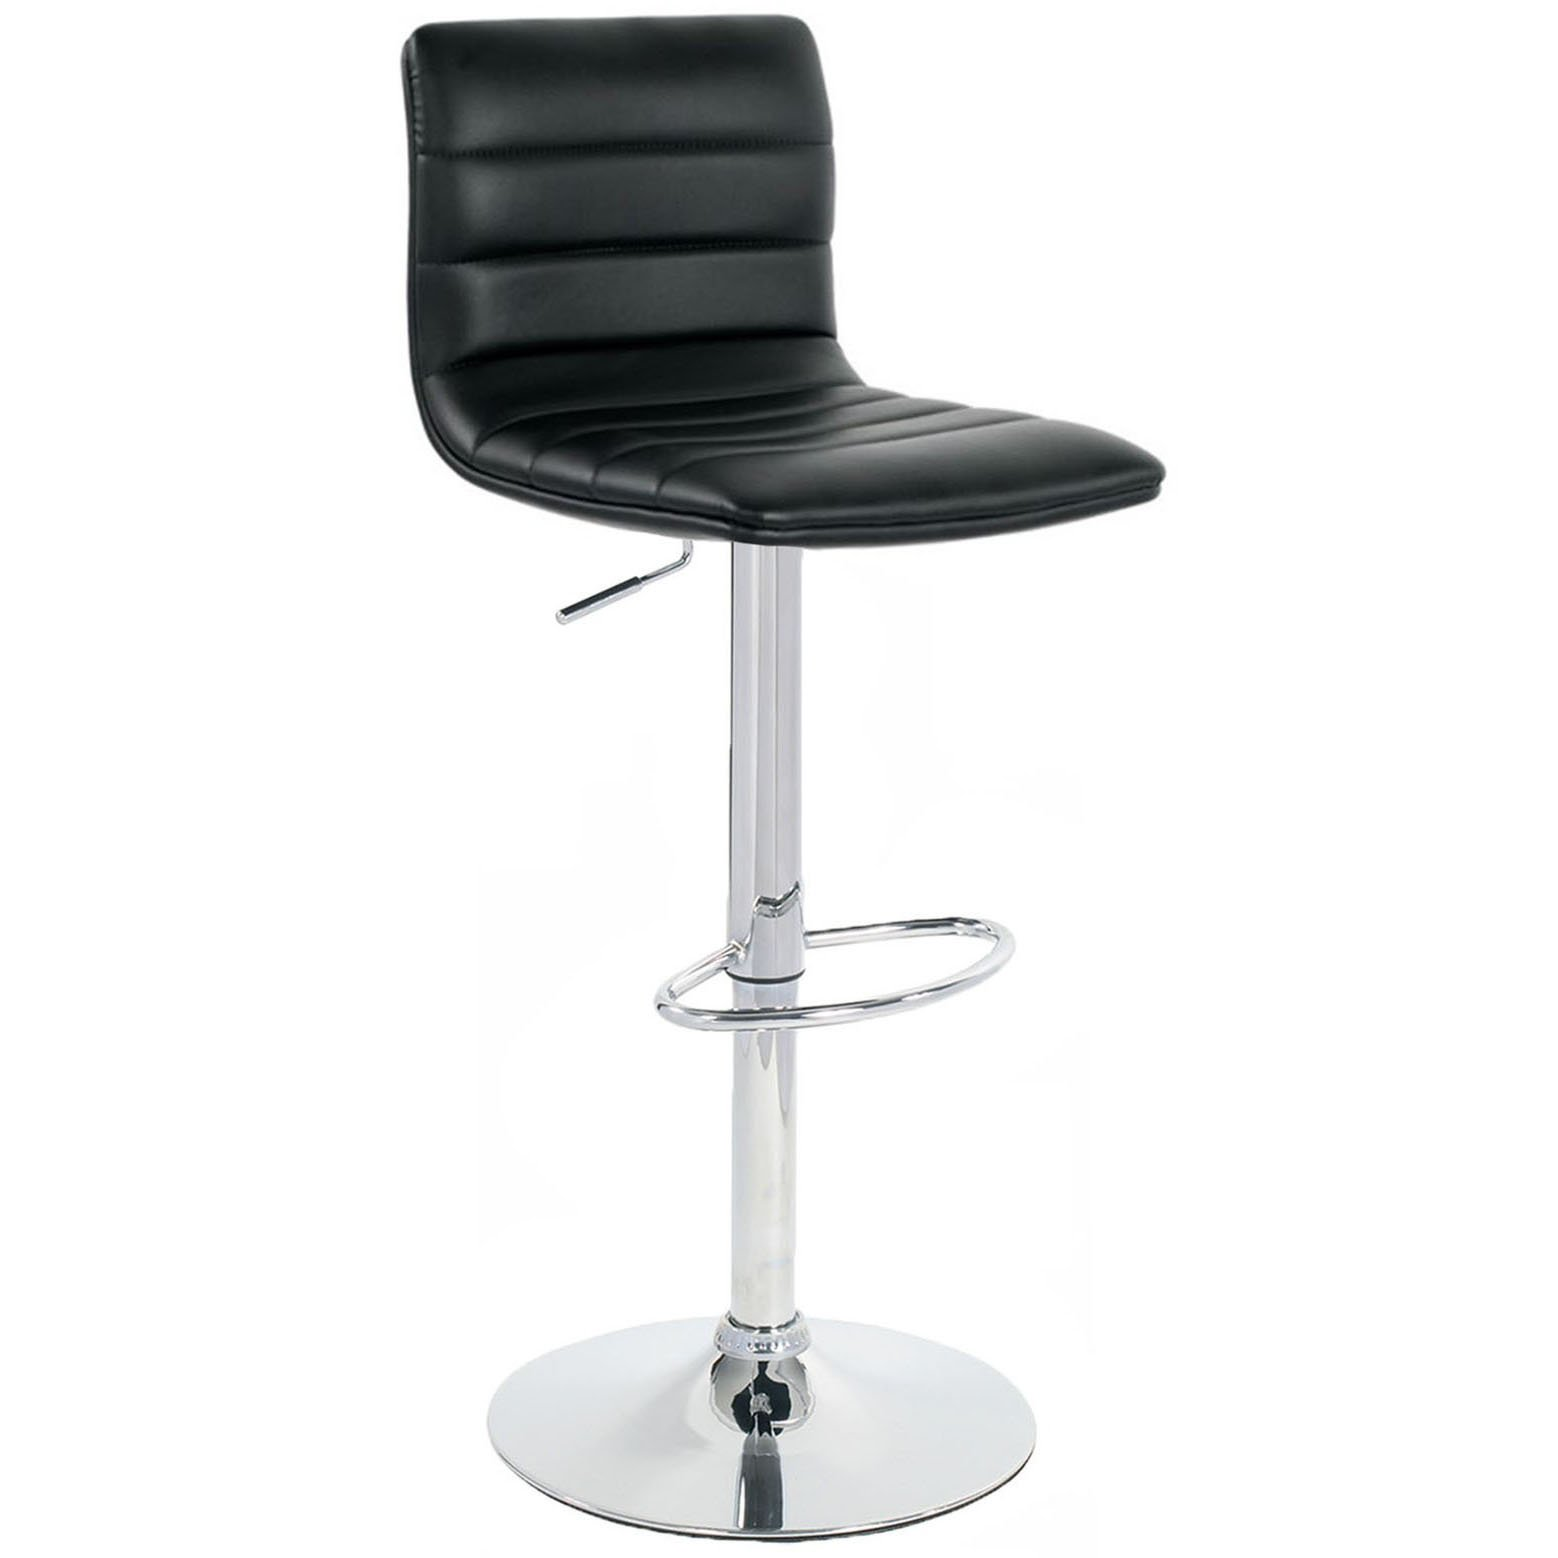 bar stools uk sale  kitchen bar stools uk at trade prices